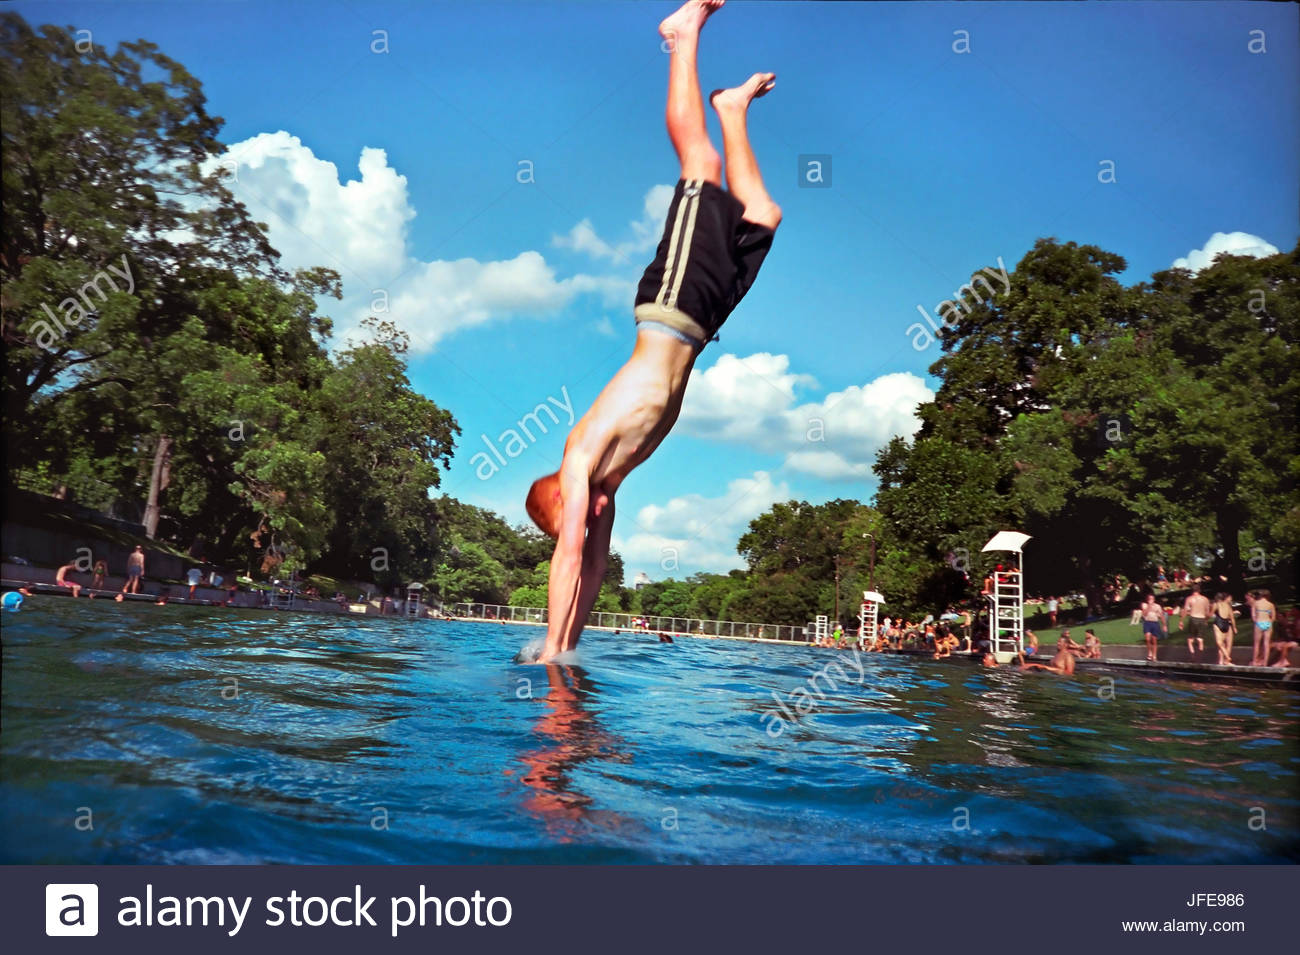 A boy dives into Barton Springs' natural swimming pool. - Stock Image